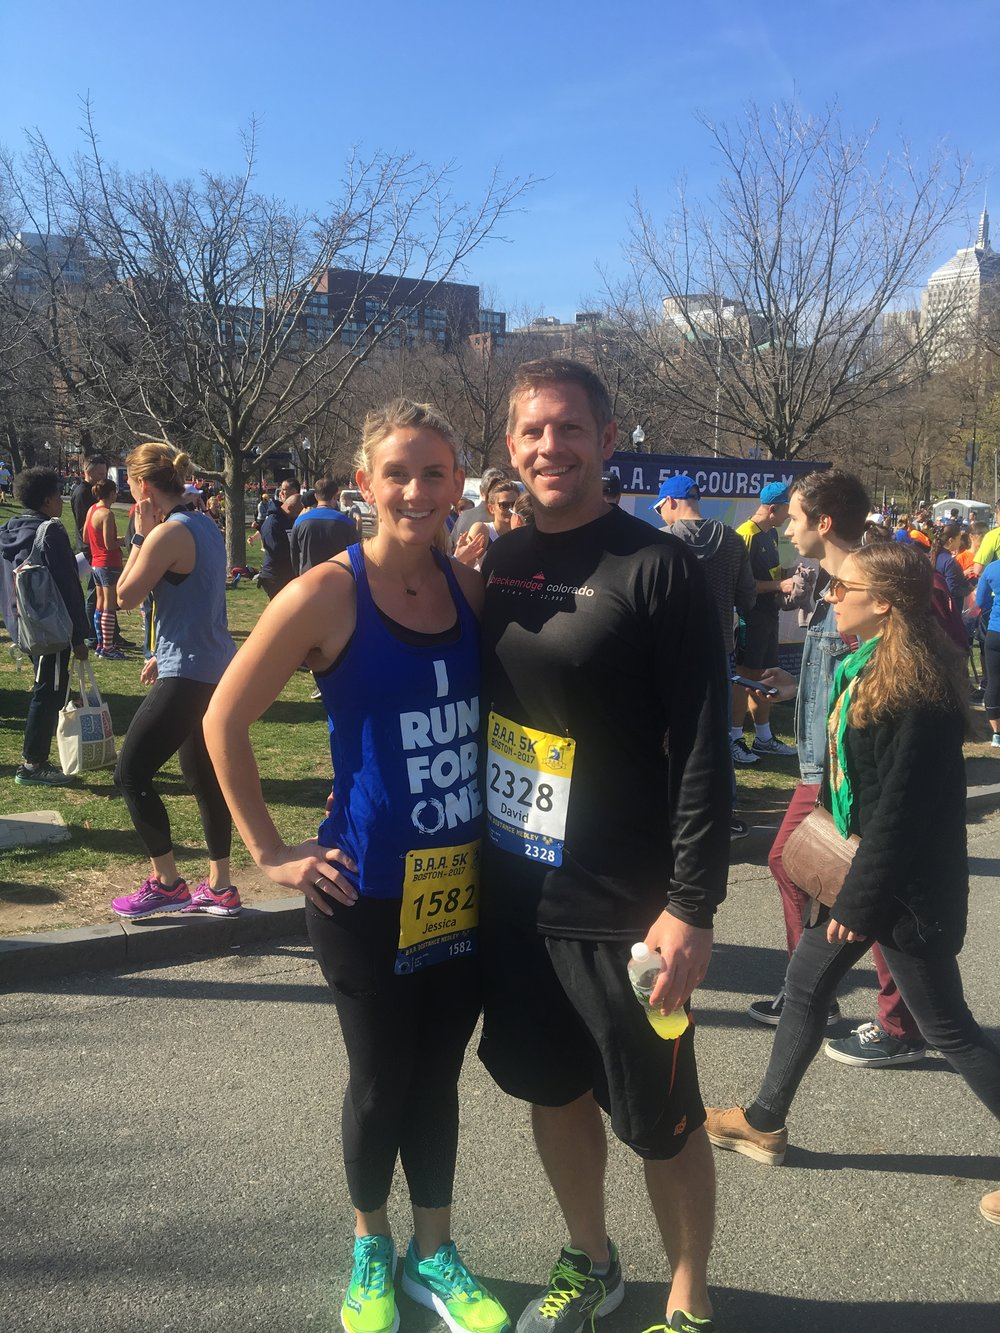 First Boston race!